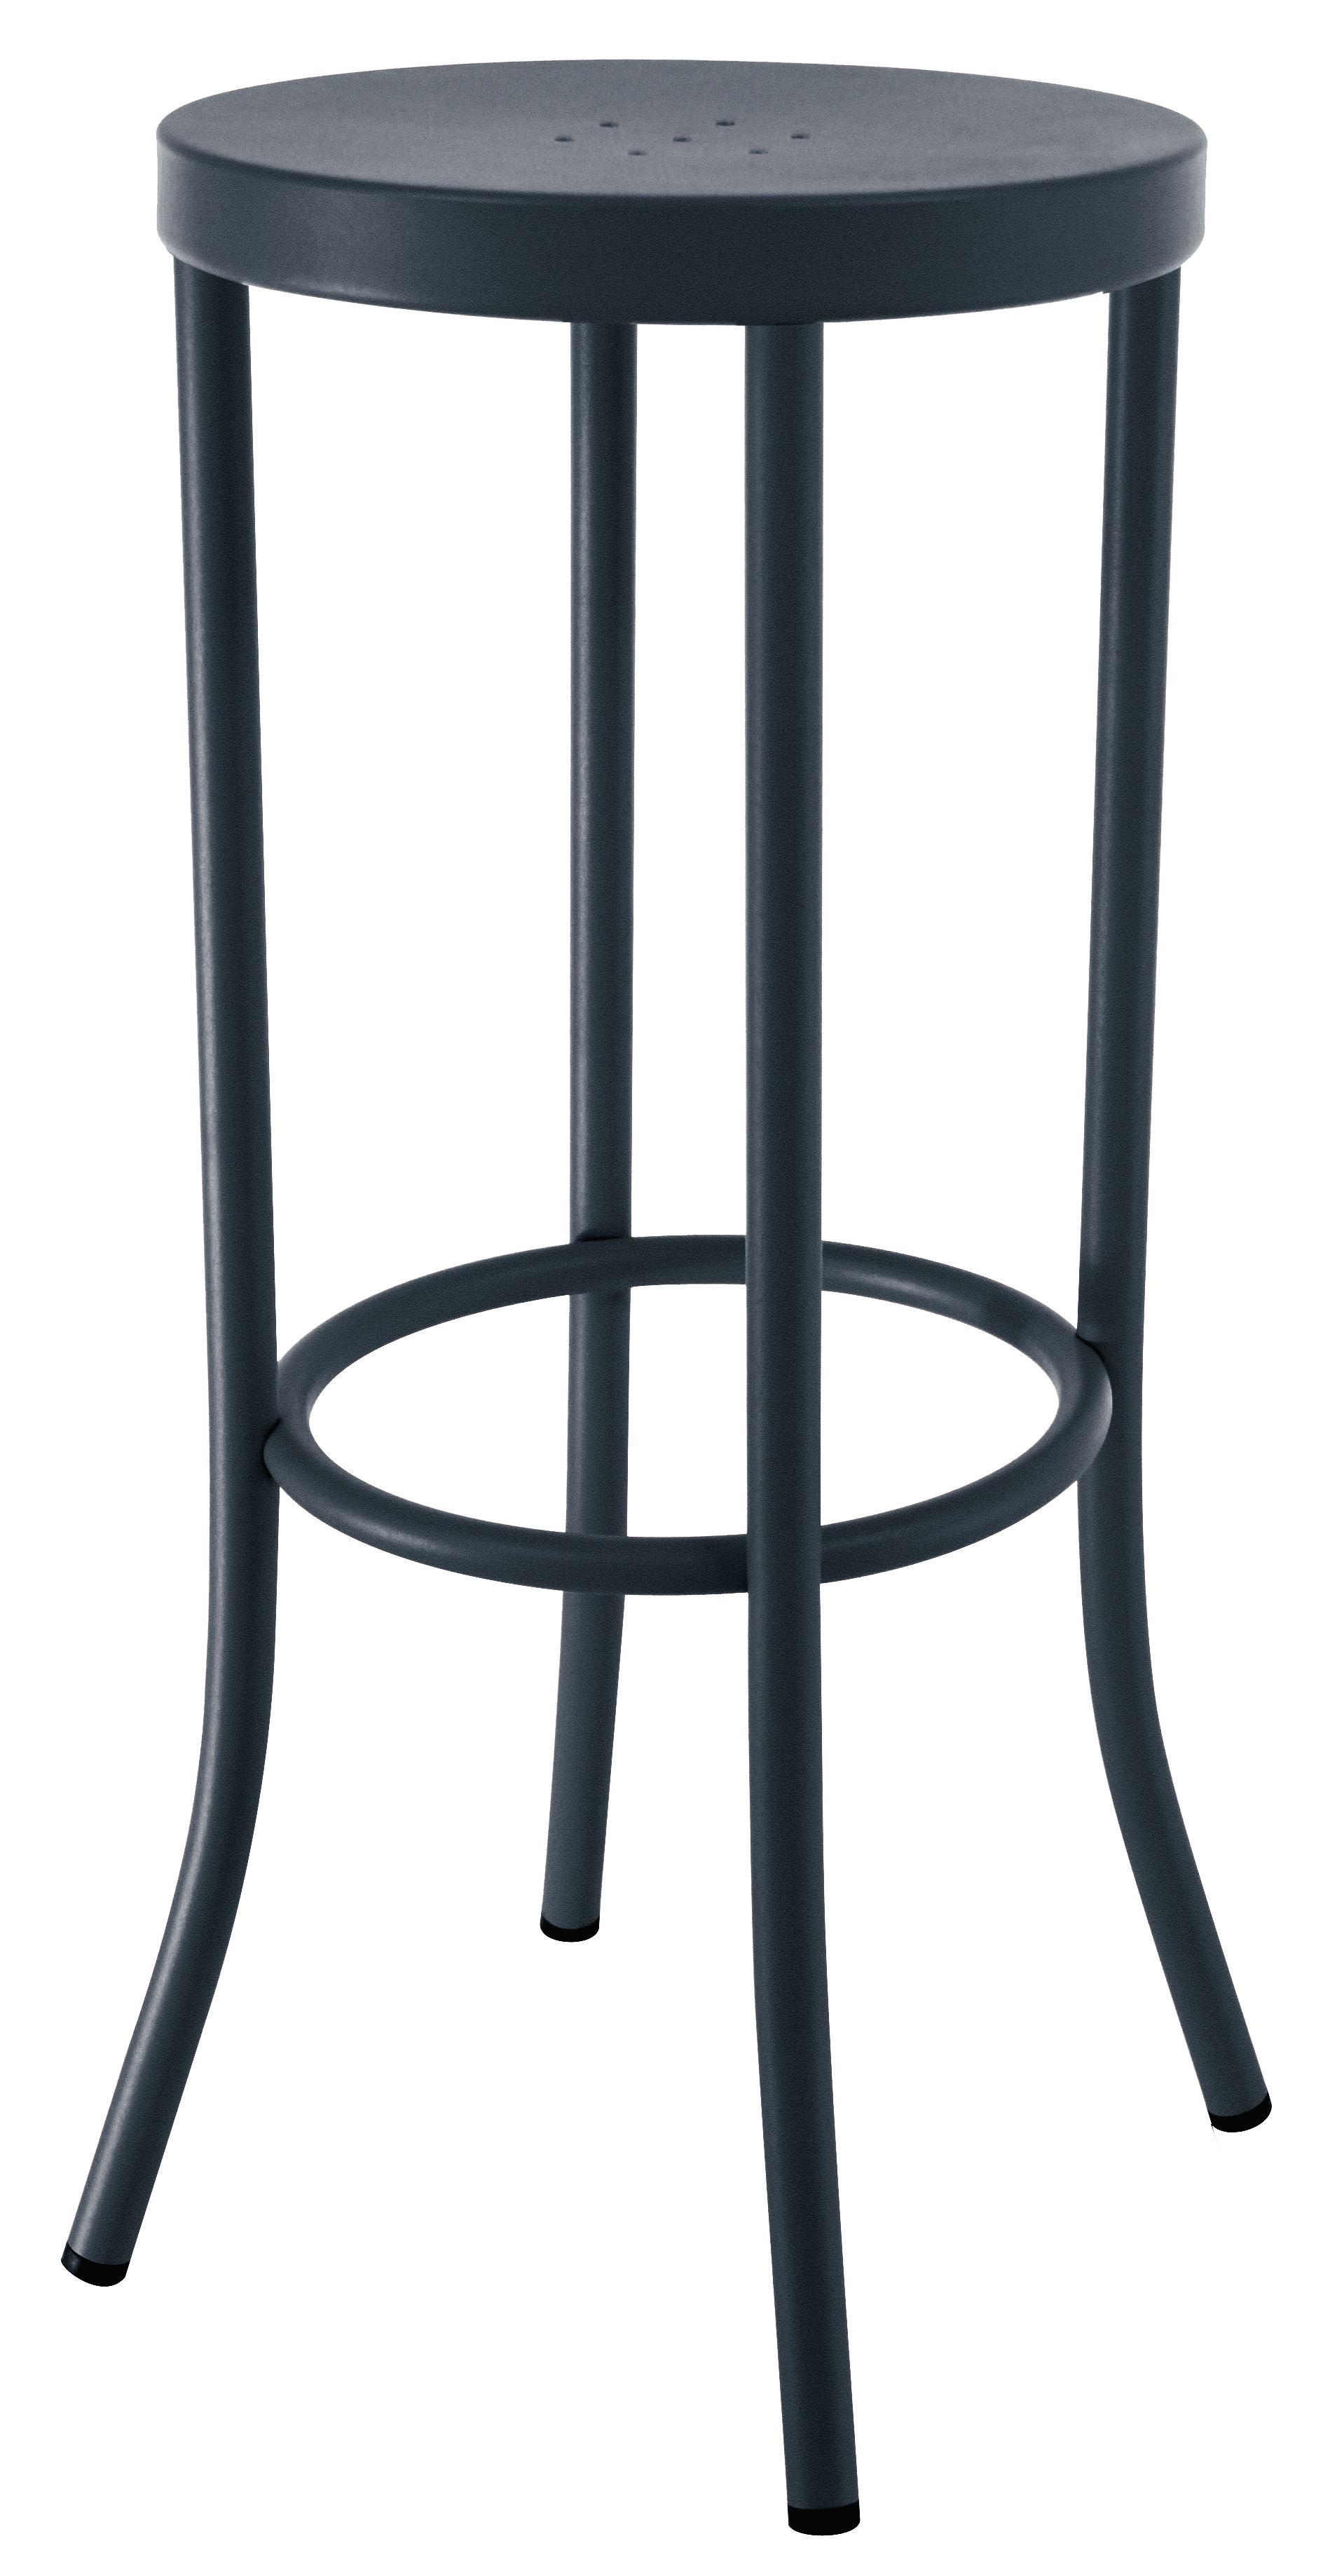 tabouret de bar ds n 1 h 80 cm acier peint gris. Black Bedroom Furniture Sets. Home Design Ideas